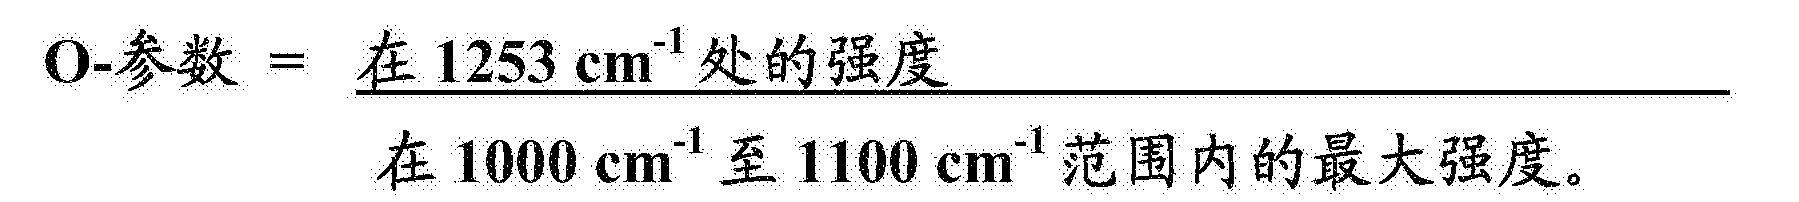 Figure CN108883172AD00321